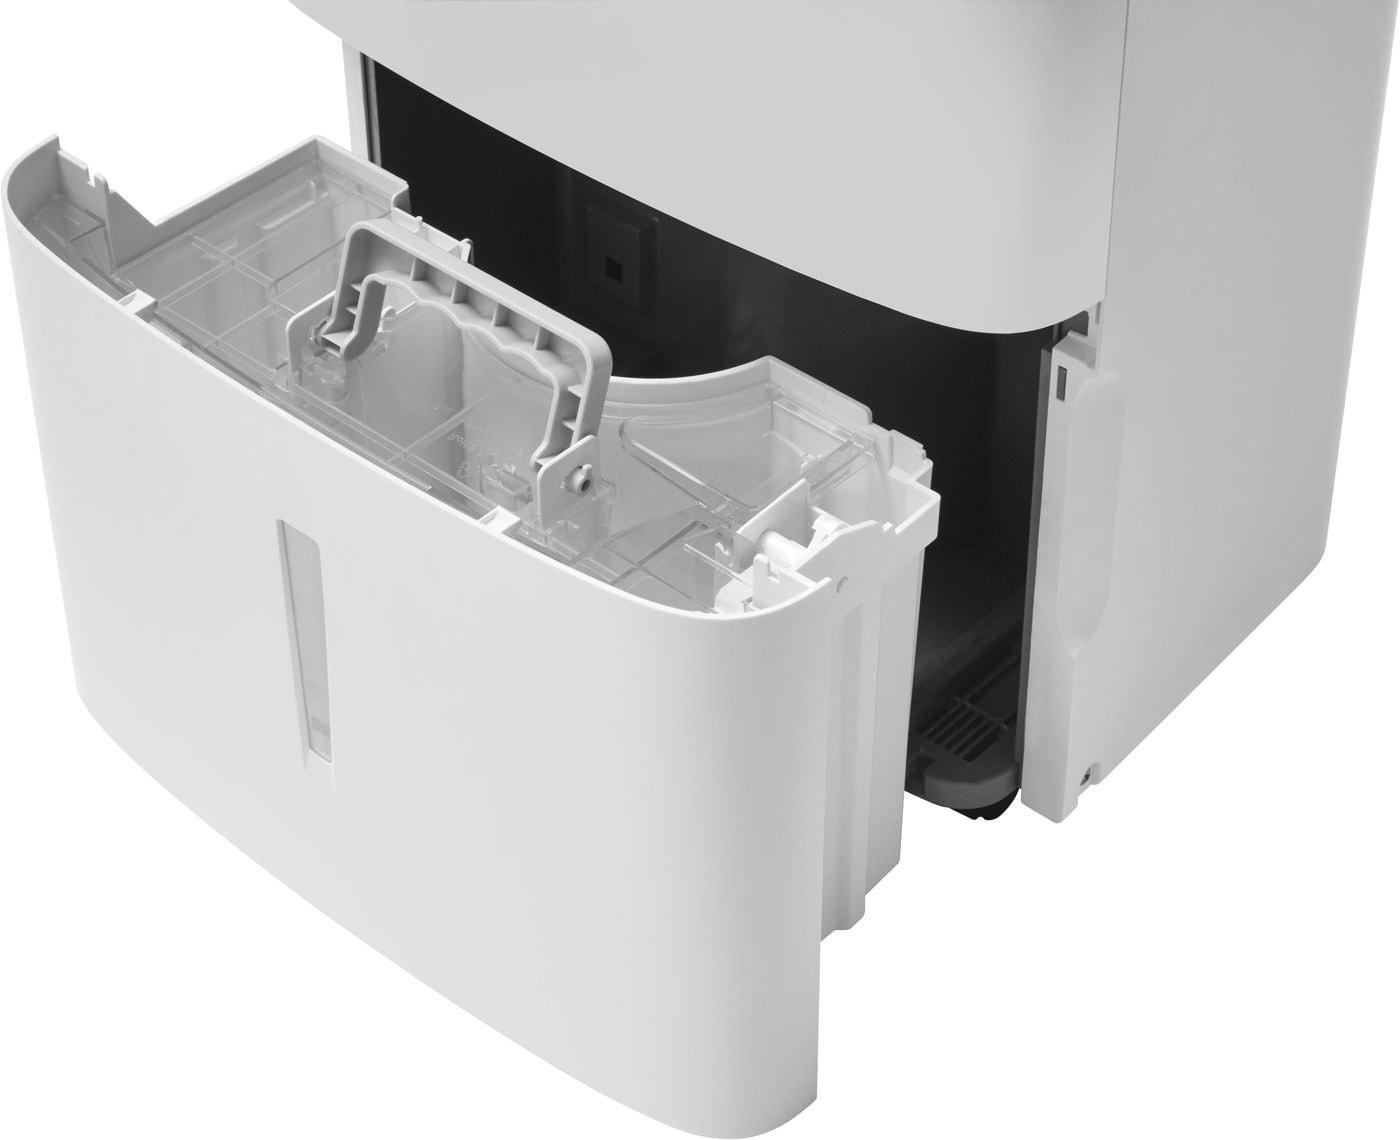 Model: FFAD5033W1 | Frigidaire High Humidity 50 Pint Capacity Dehumidifier